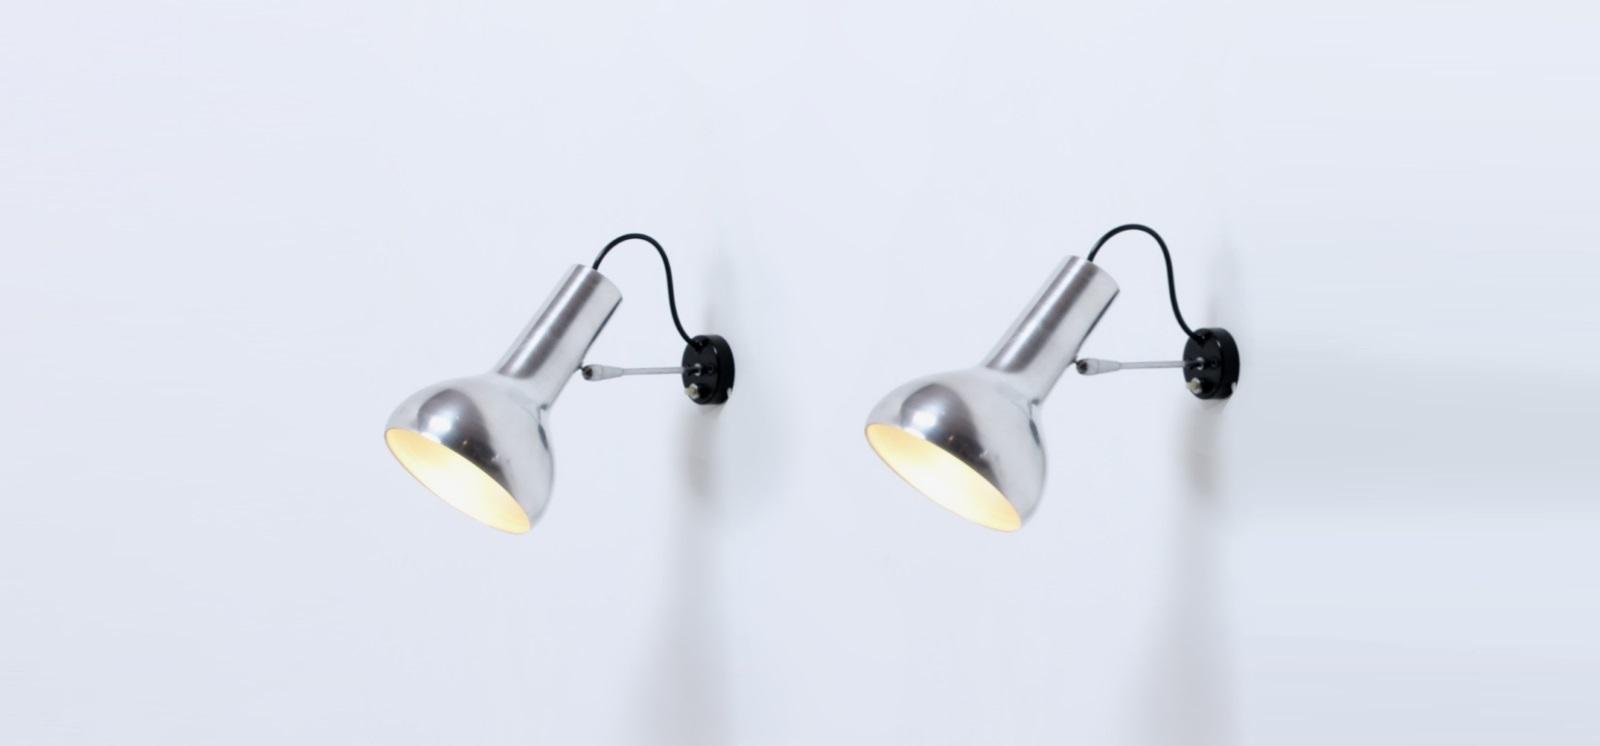 arteluce sarfatti nr 7 wall lights 1957 cencity